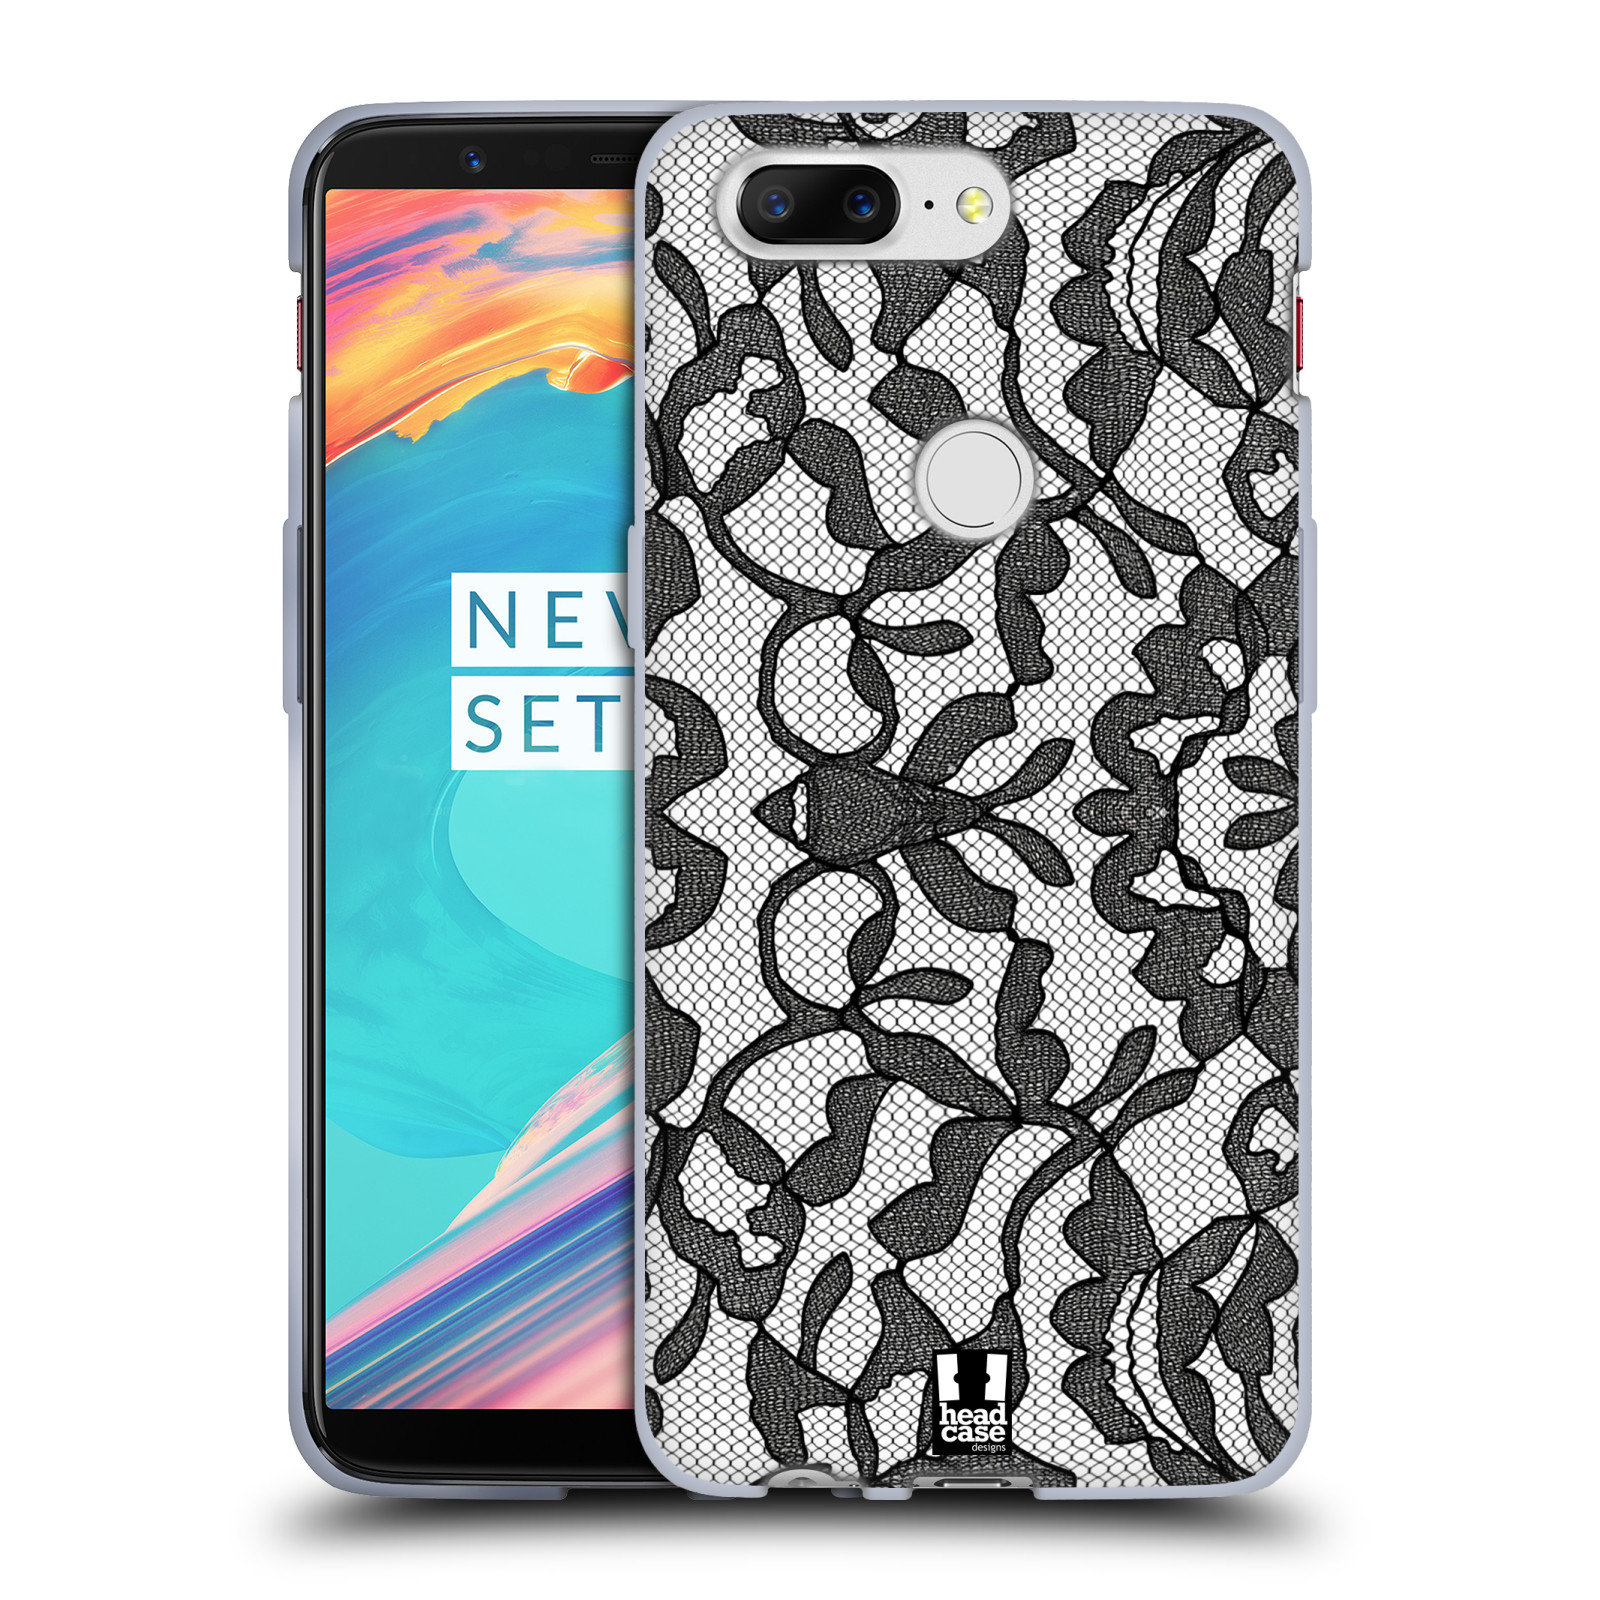 Silikonové pouzdro na mobil OnePlus 5T - Head Case - LEAFY KRAJKA